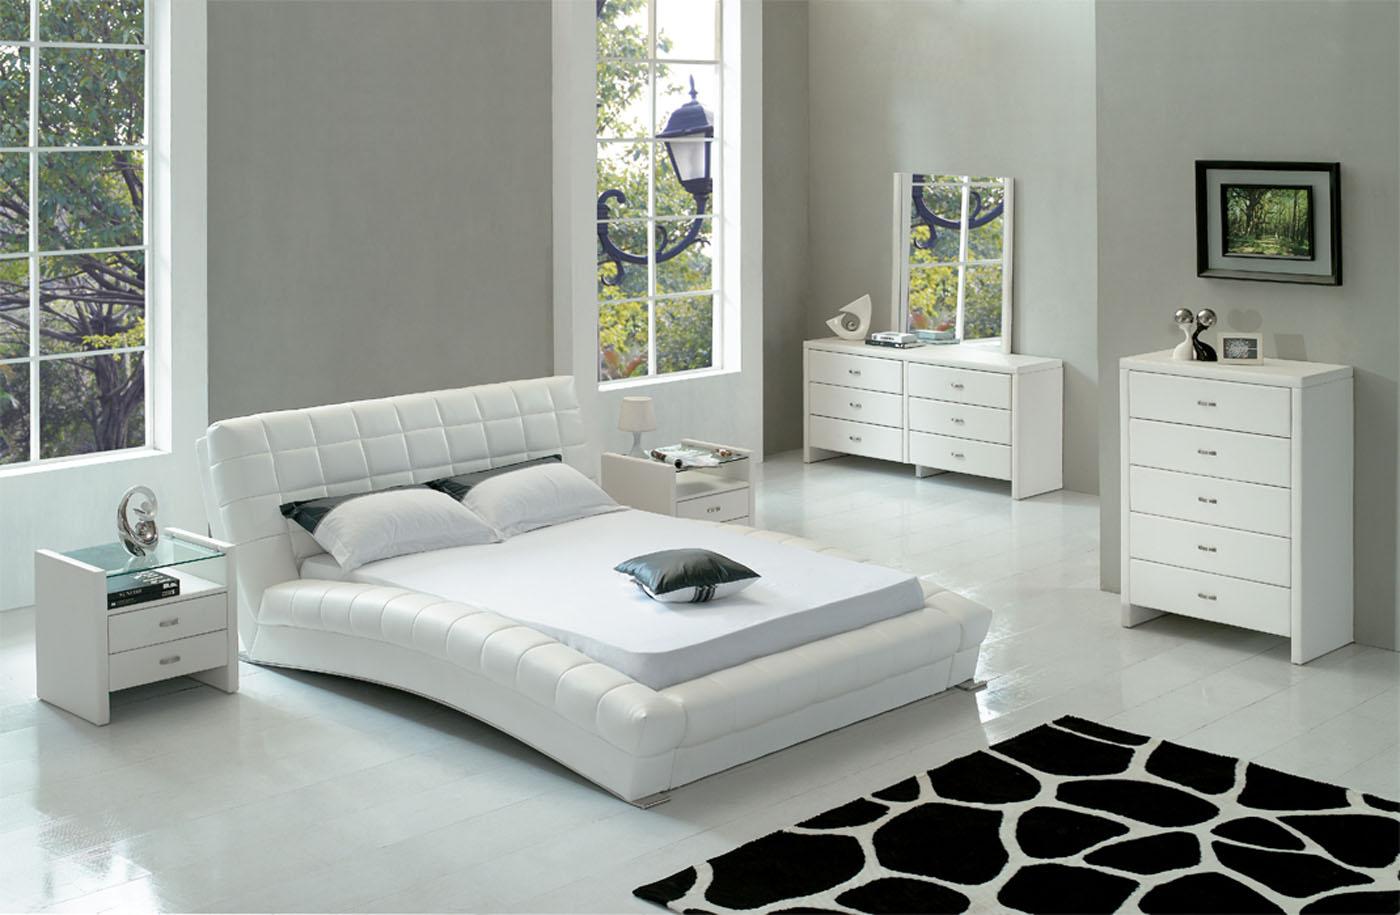 modern white bedroom furniture sets photo - 6